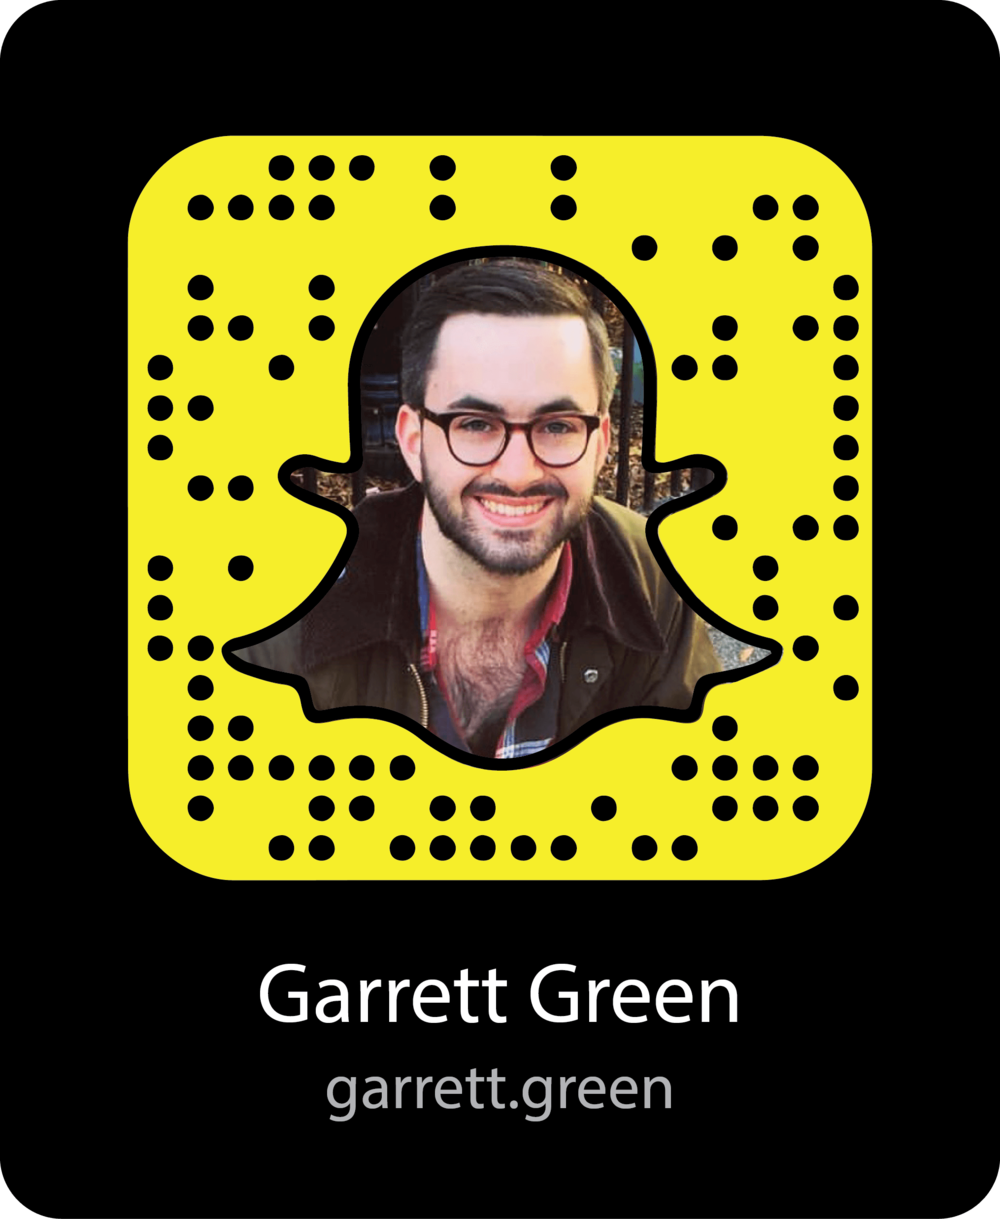 garrett-green-storytellers-snapchat-snapcode